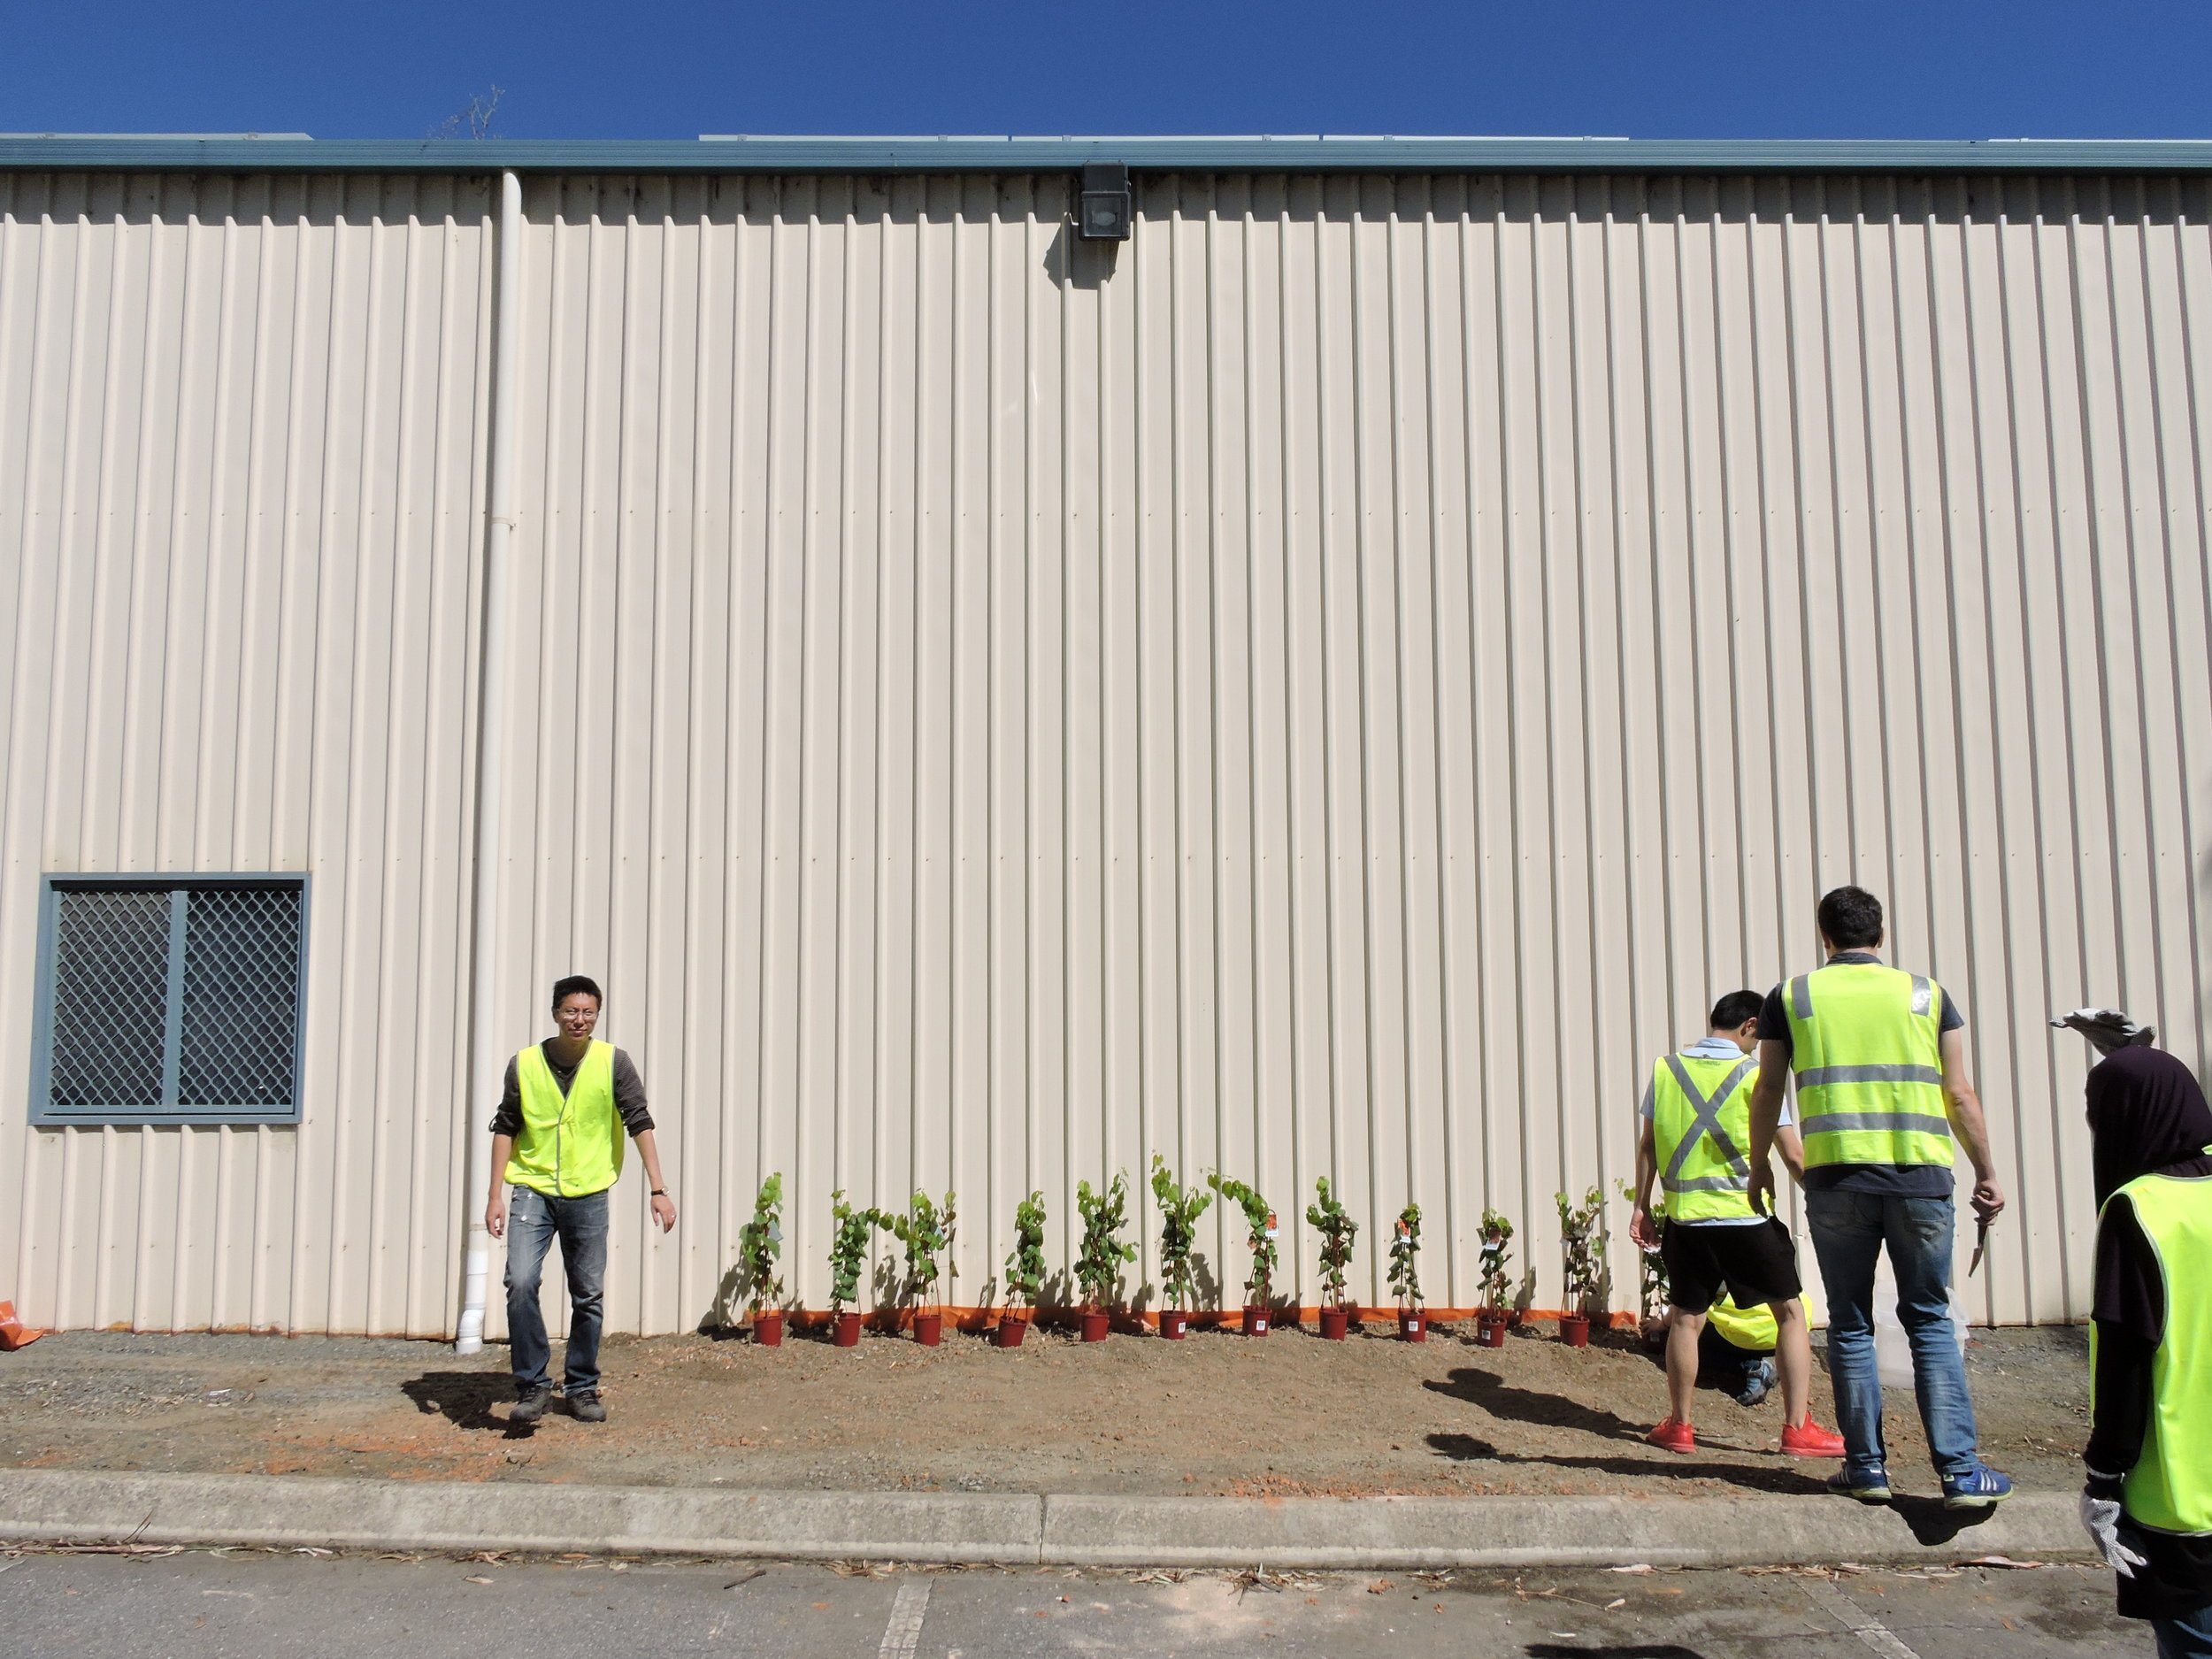 20160321_JQF04_urban planting (20).JPG